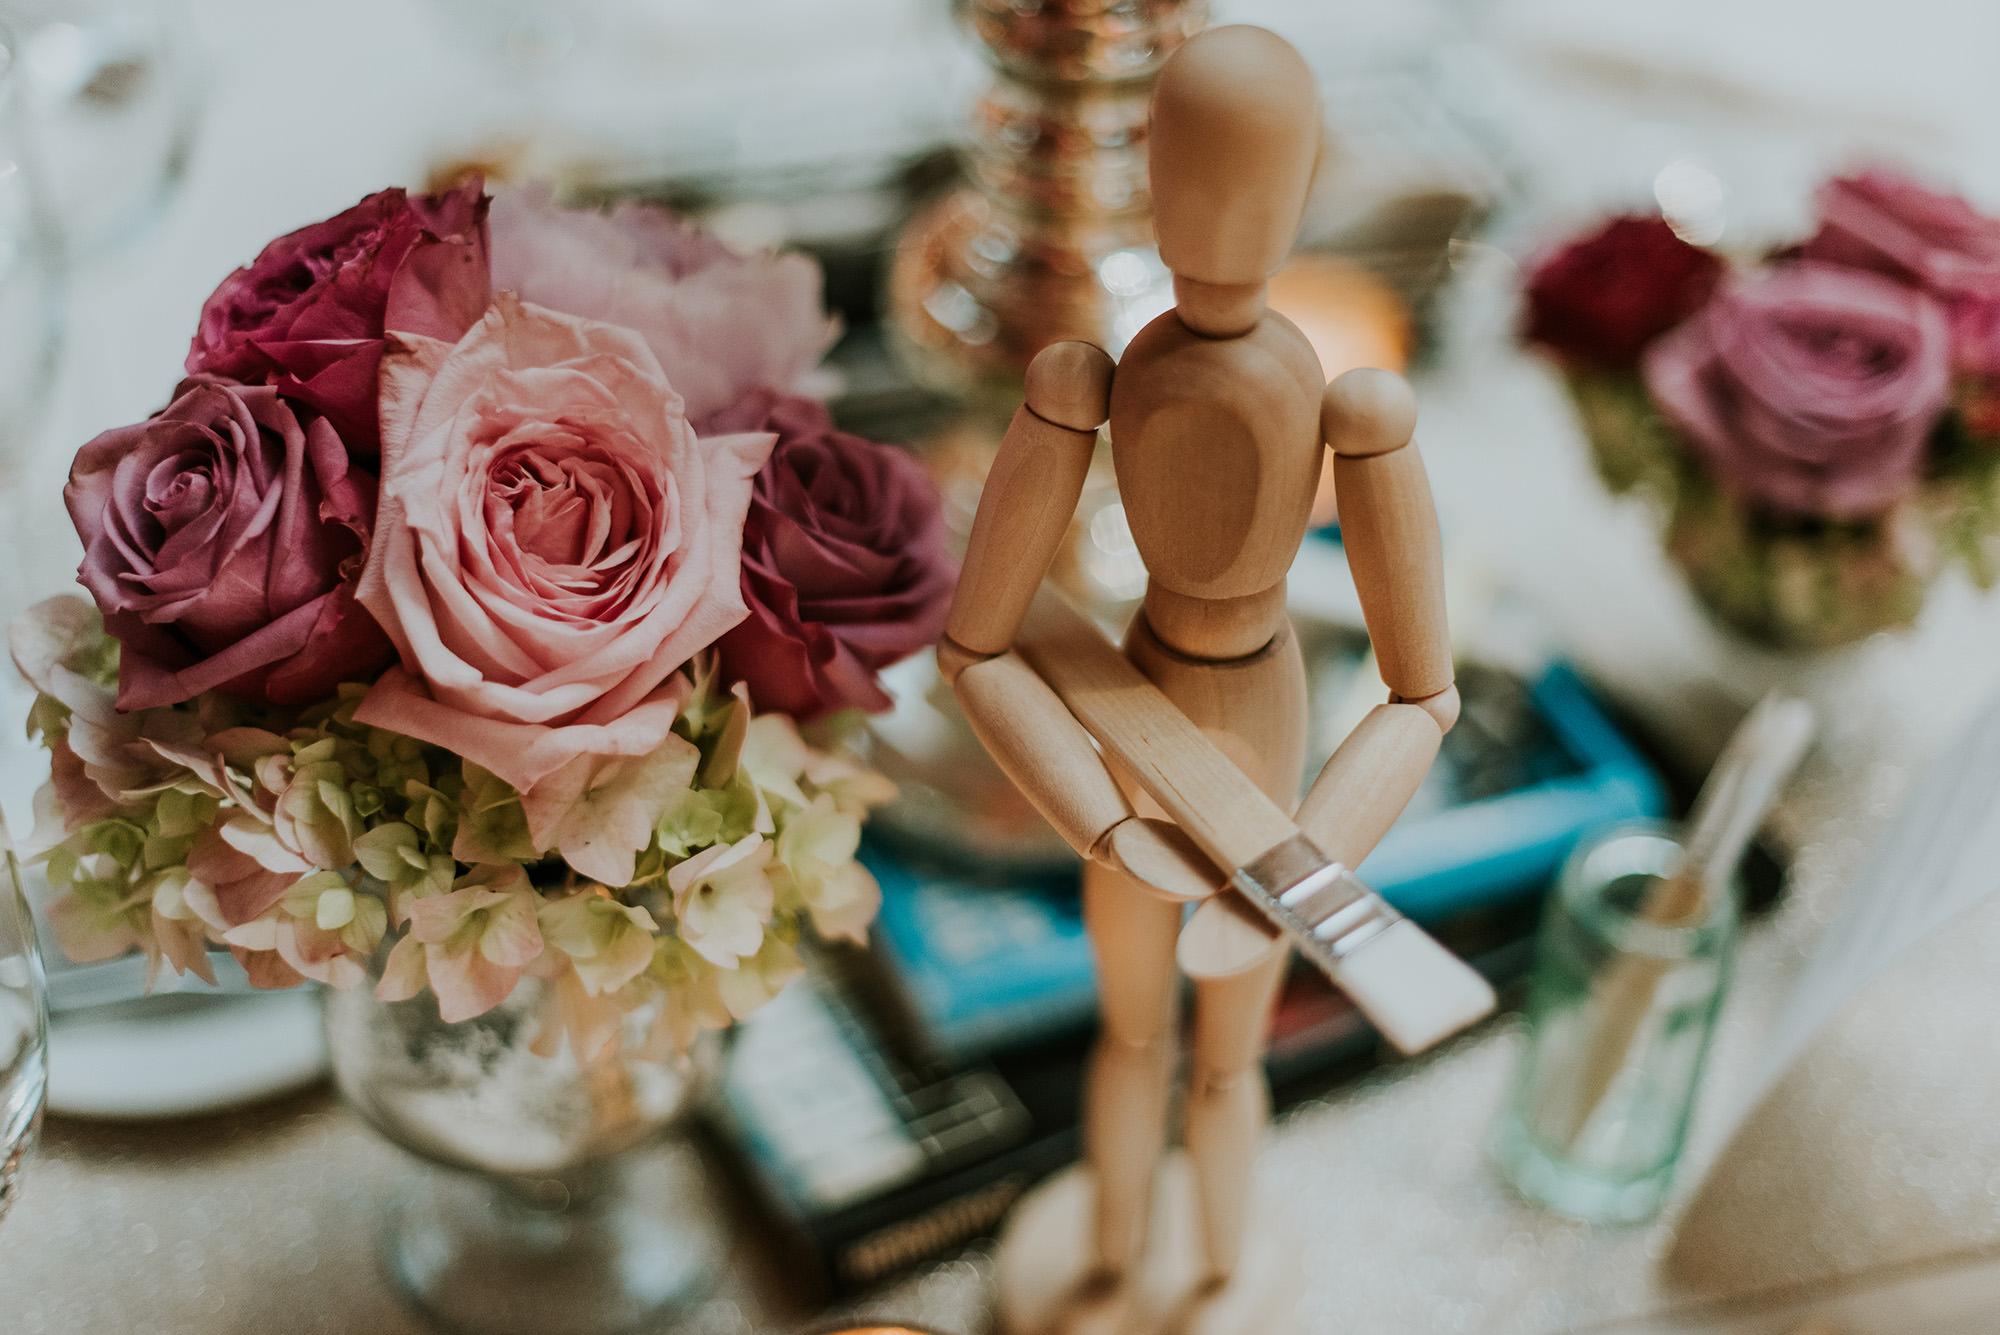 55 Blush Rose Cool Water Rose Antique Hydrangea Art Museum Wedding Details.jpg